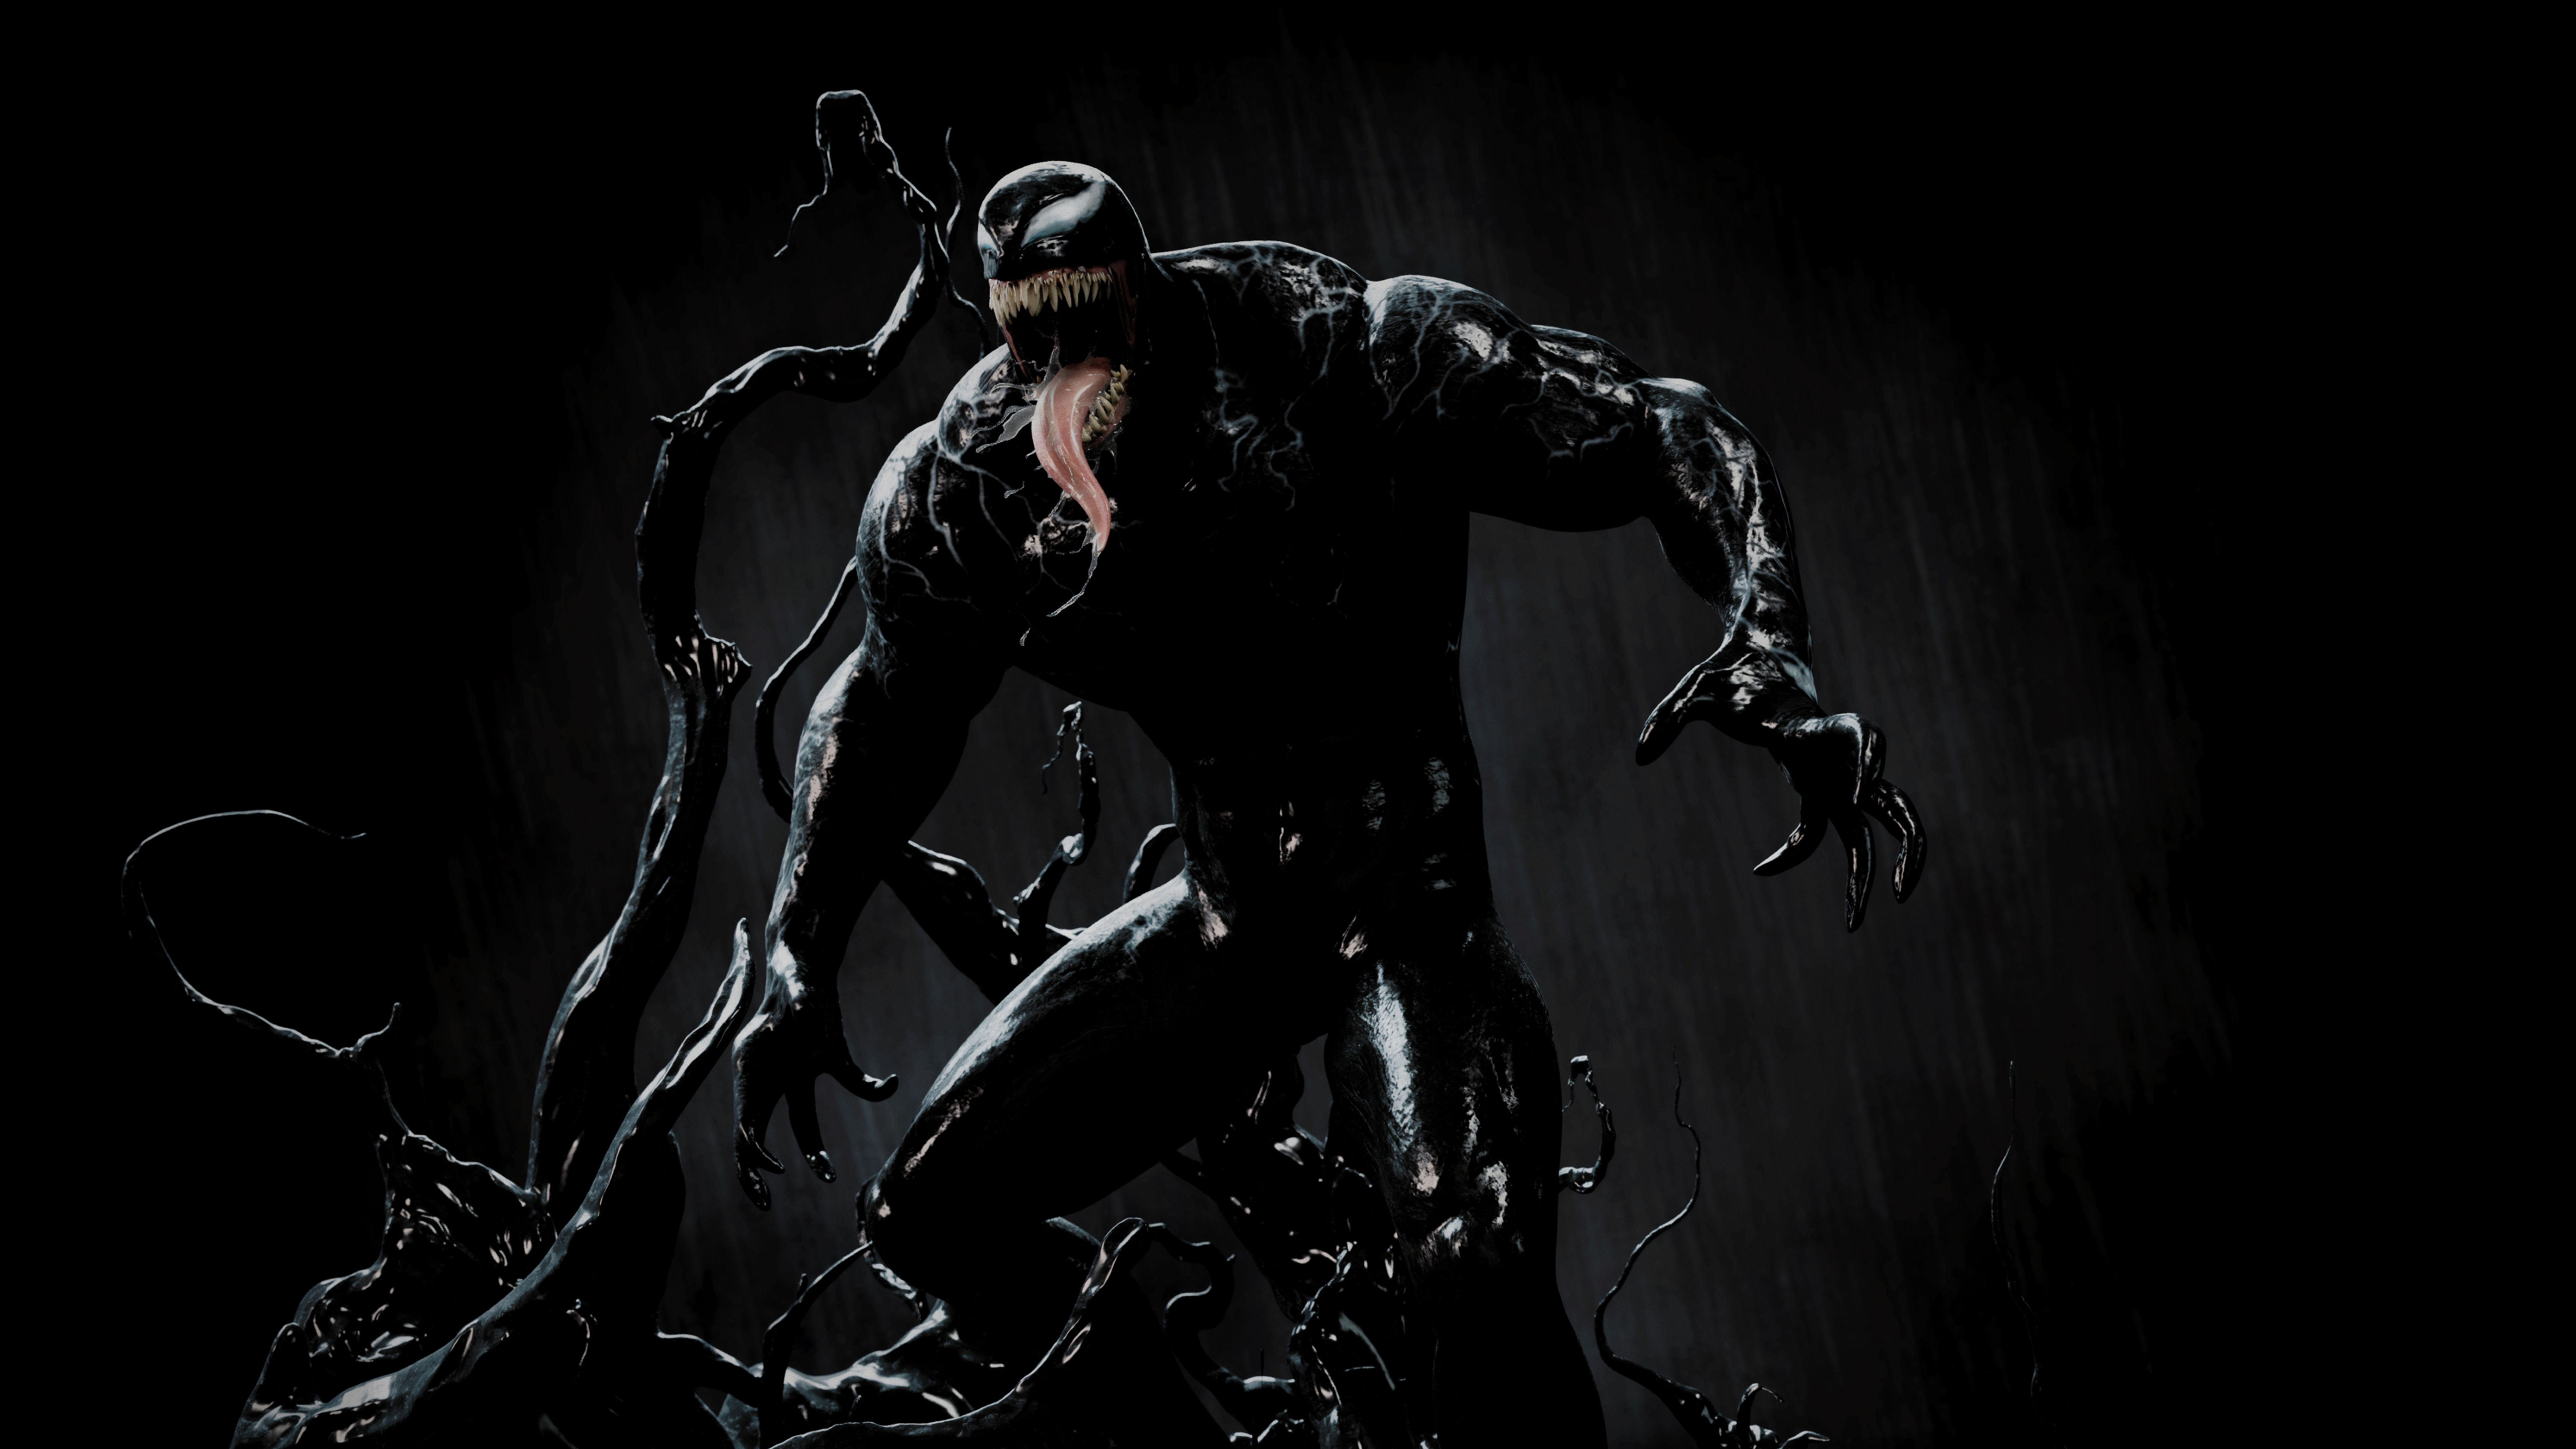 Venom Artwork 4K 8K Venom, Wallpaper, Artwork